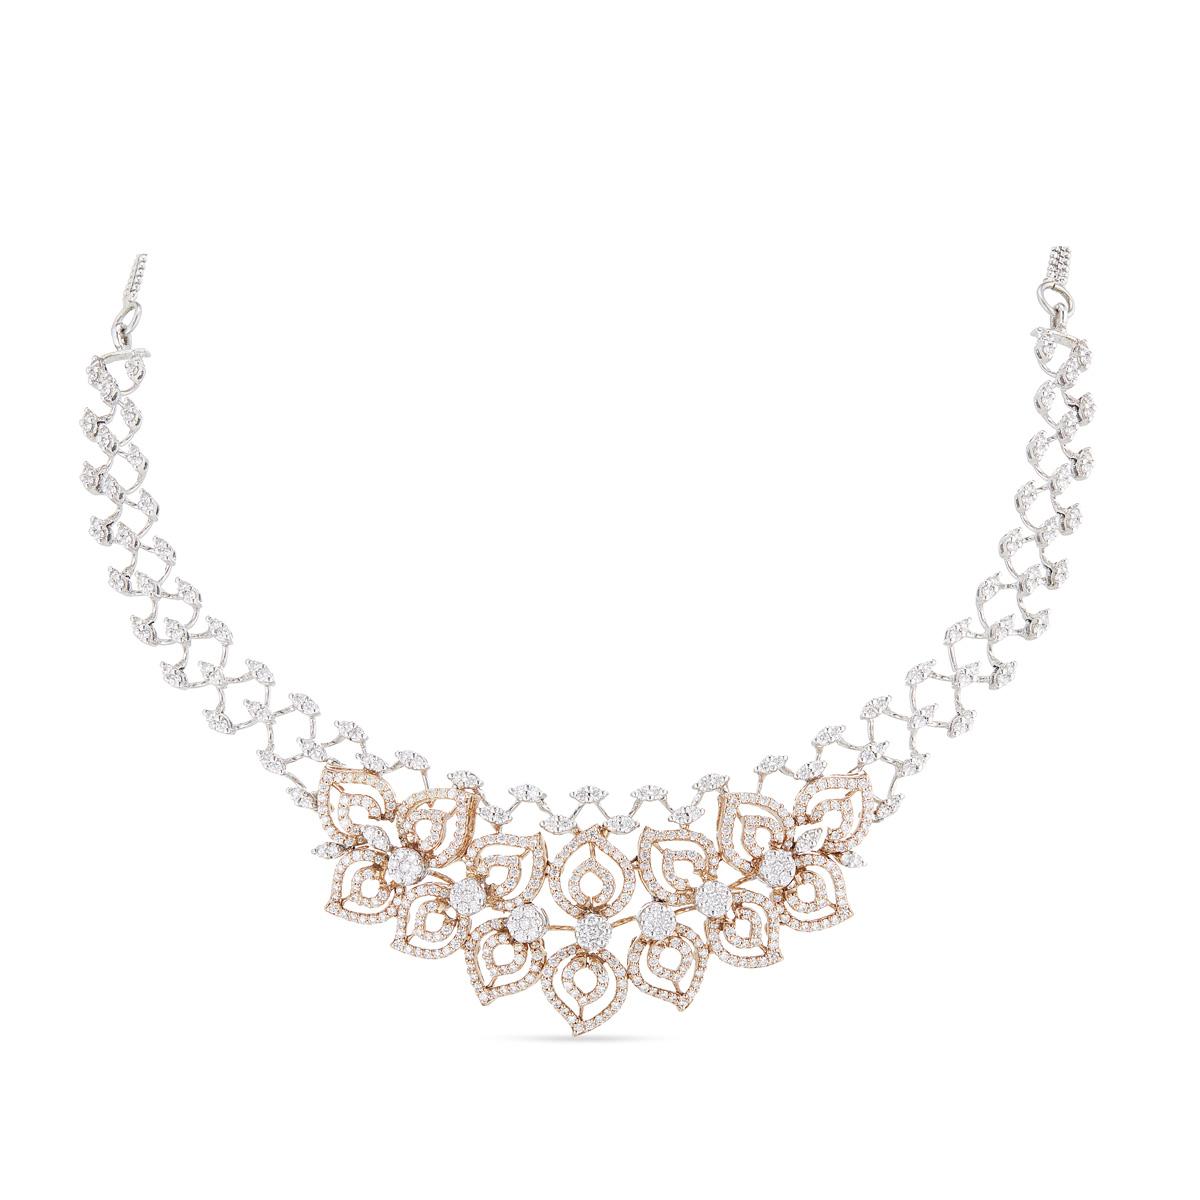 Enchanting Diamond Necklace